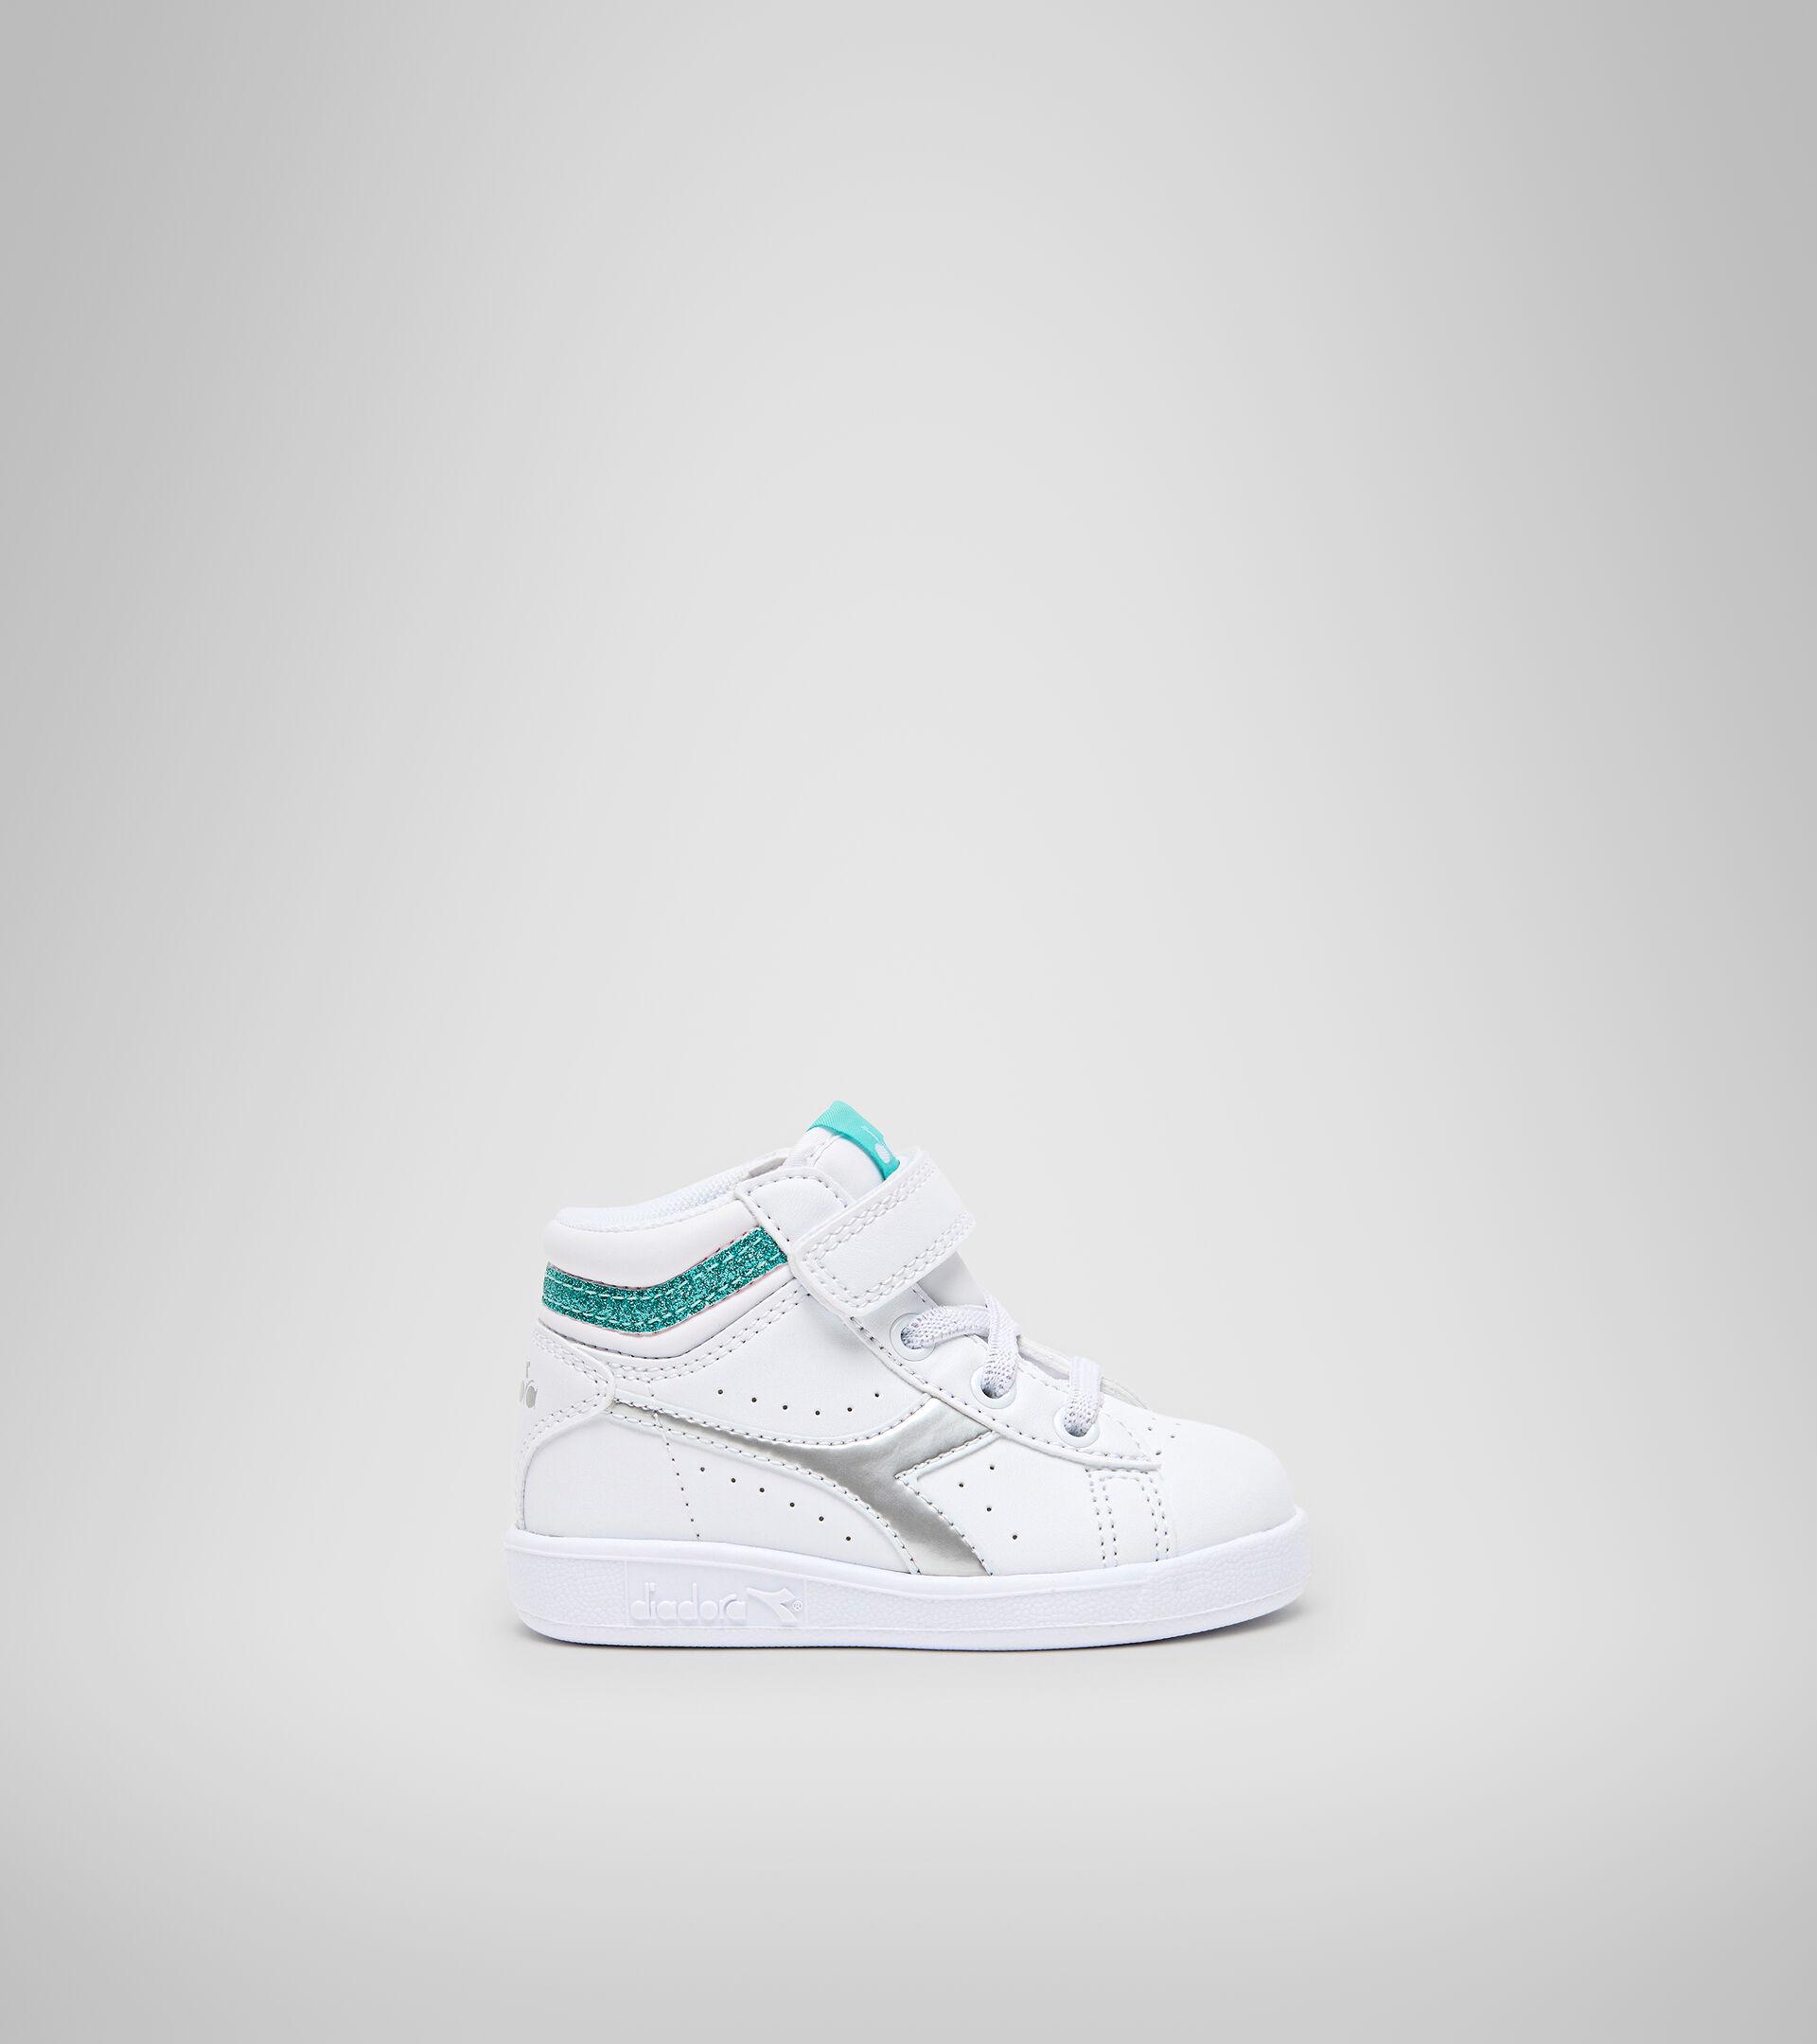 Footwear Sport BAMBINO GAME P HIGH GIRL TD WHITE/BLUE TURQUOISE Diadora